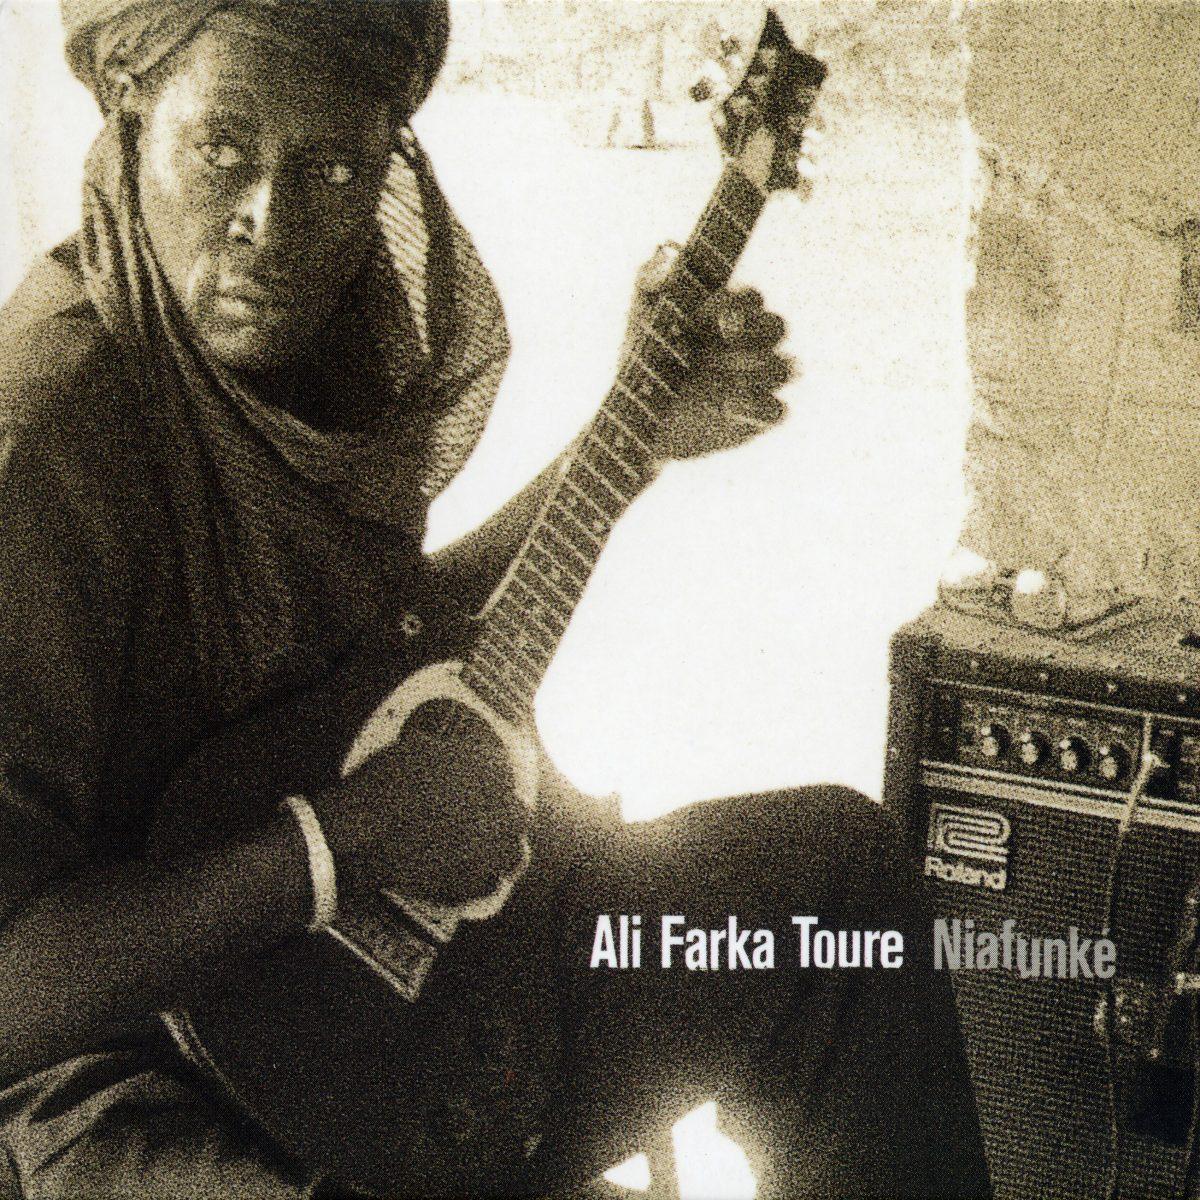 Niafunké